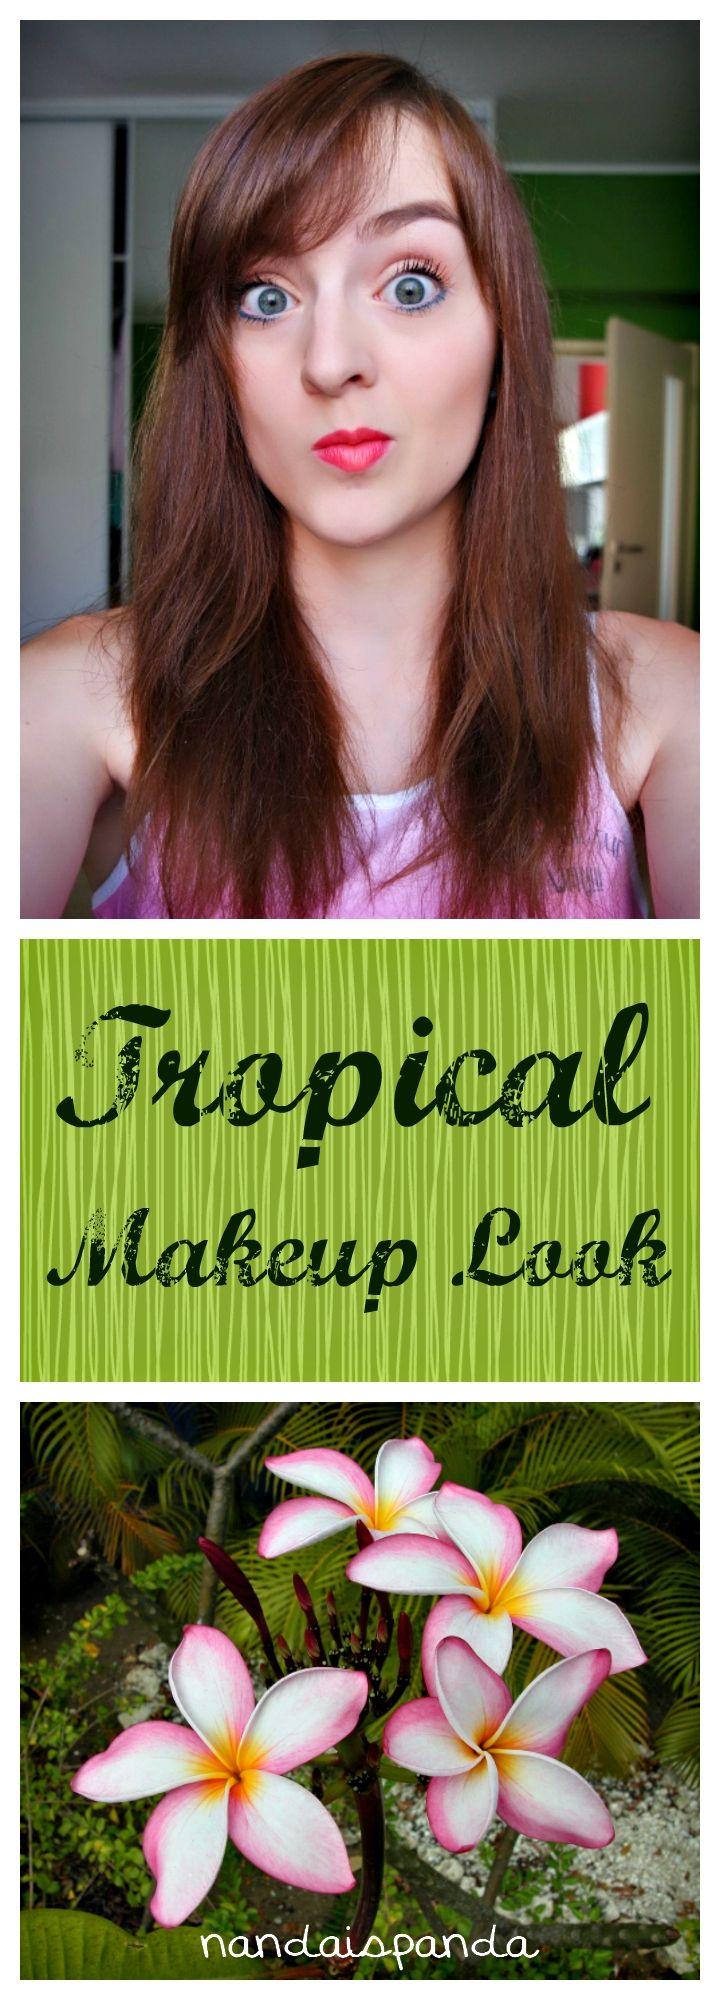 tropical, makeup look, makeup, cosmetics, makeup challenge, beauty, drugstore, budget, affordable, makeup tutorial, inspired, inspirational, idea, themed